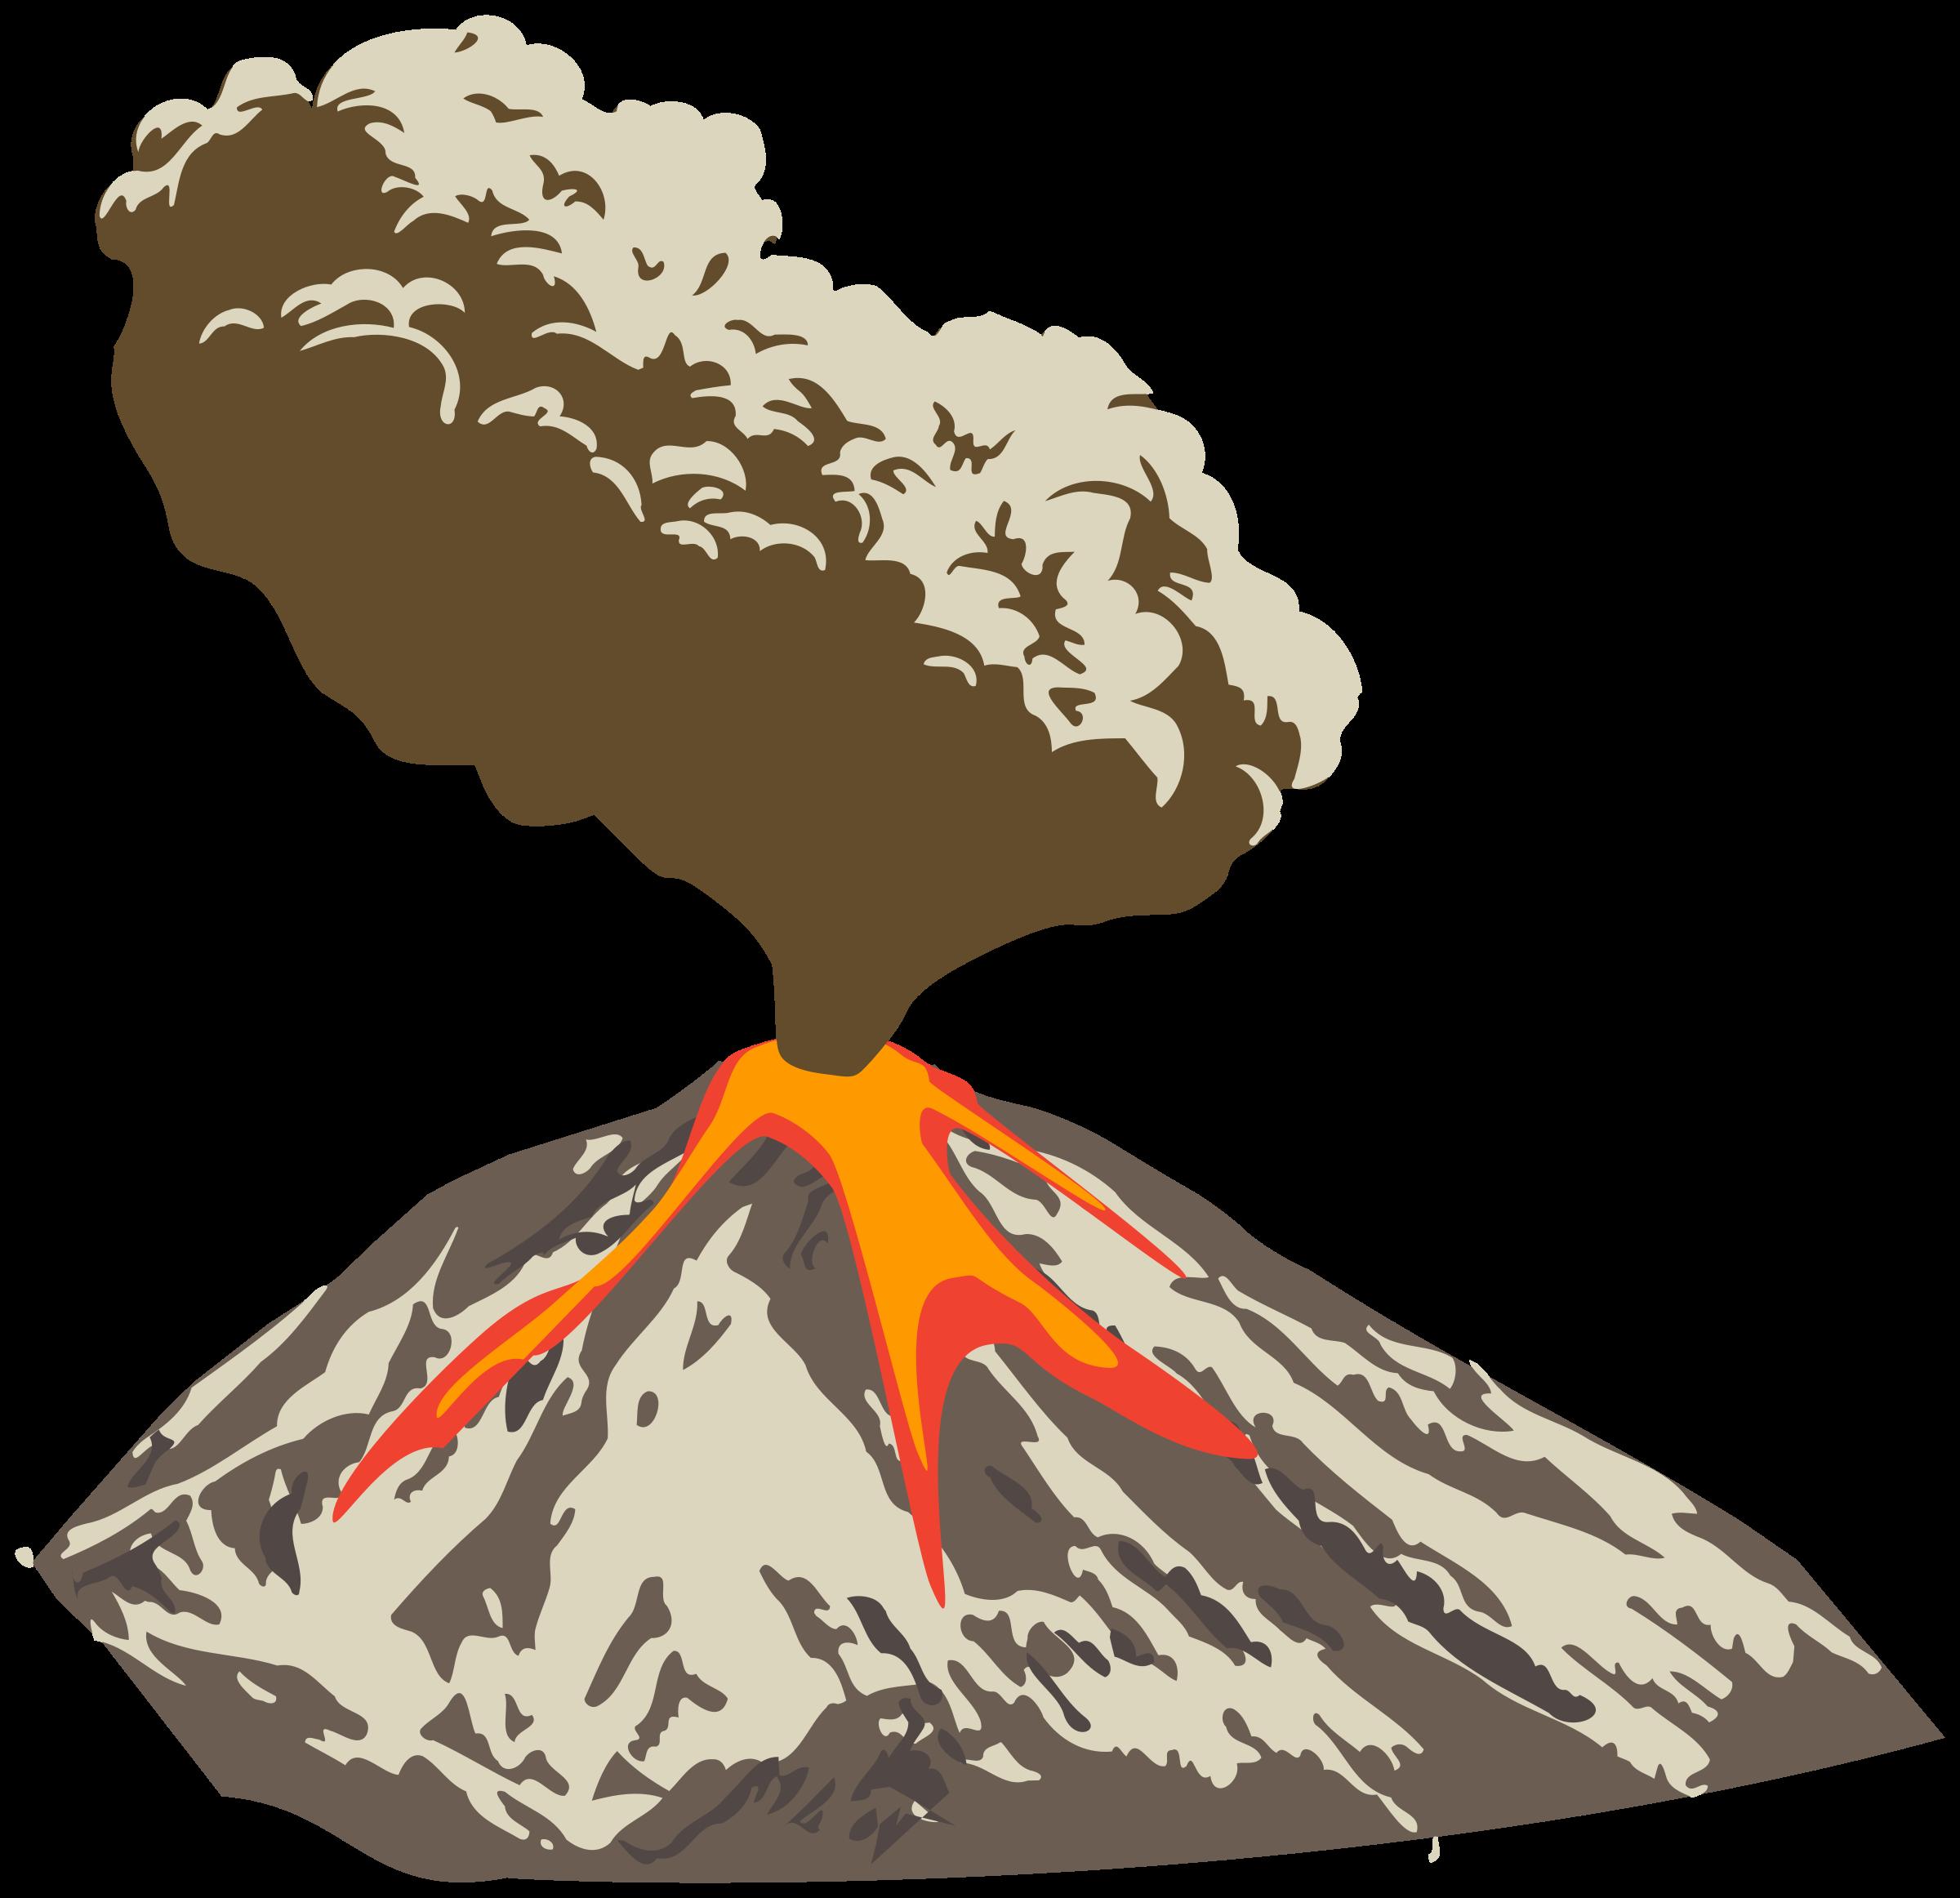 Eruption clipart Erupting Clipart volcano ash flow